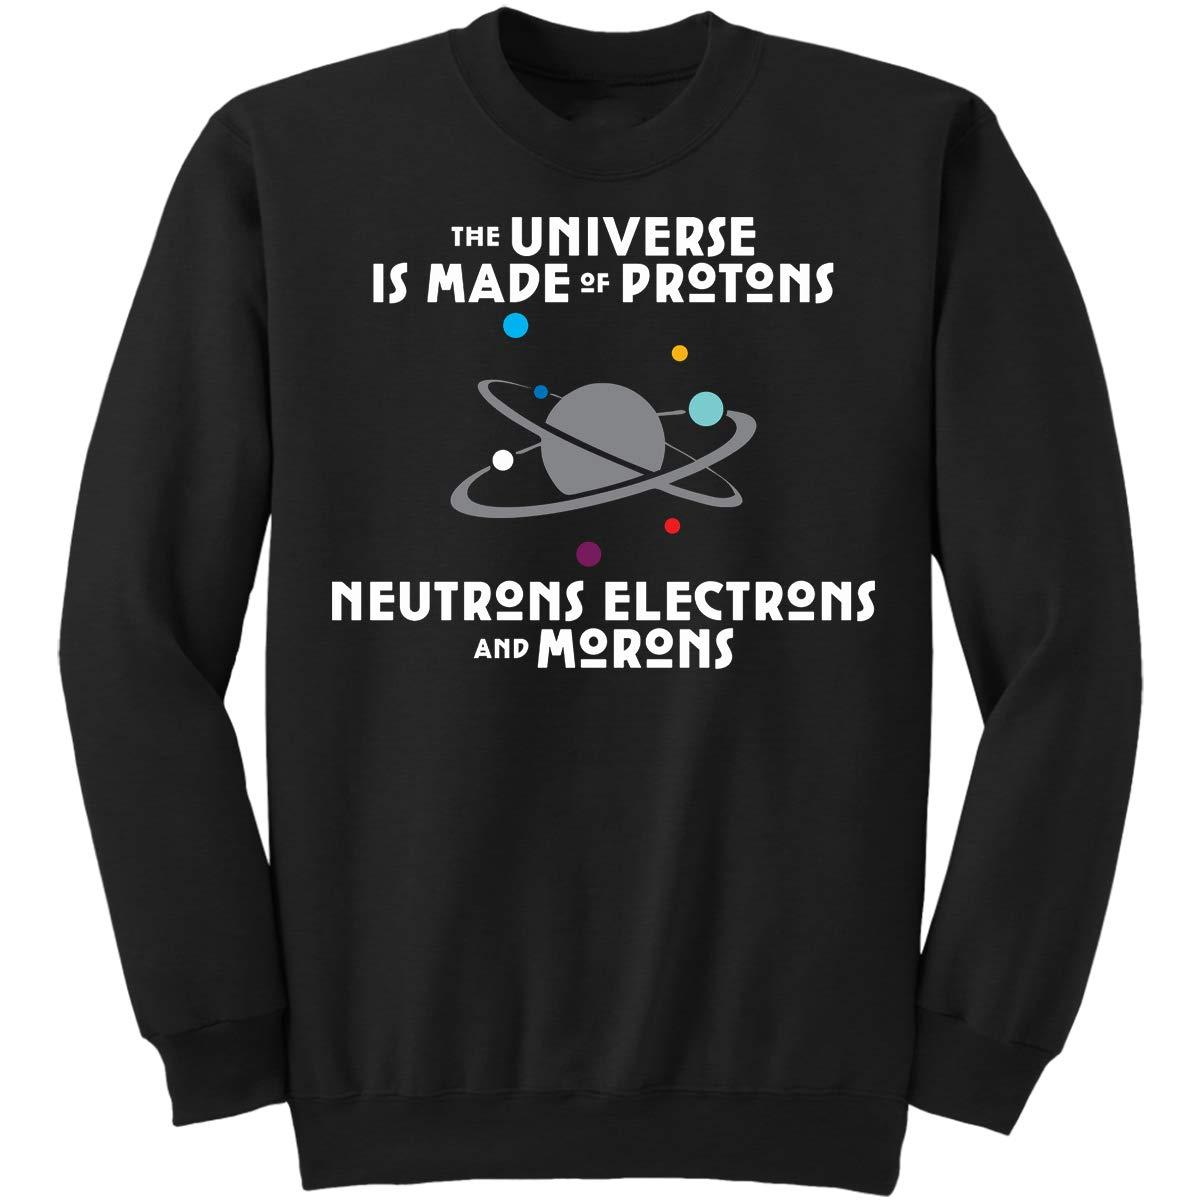 DoozyGifts99 Scientists Says Universe Made Moro Sweatshirt